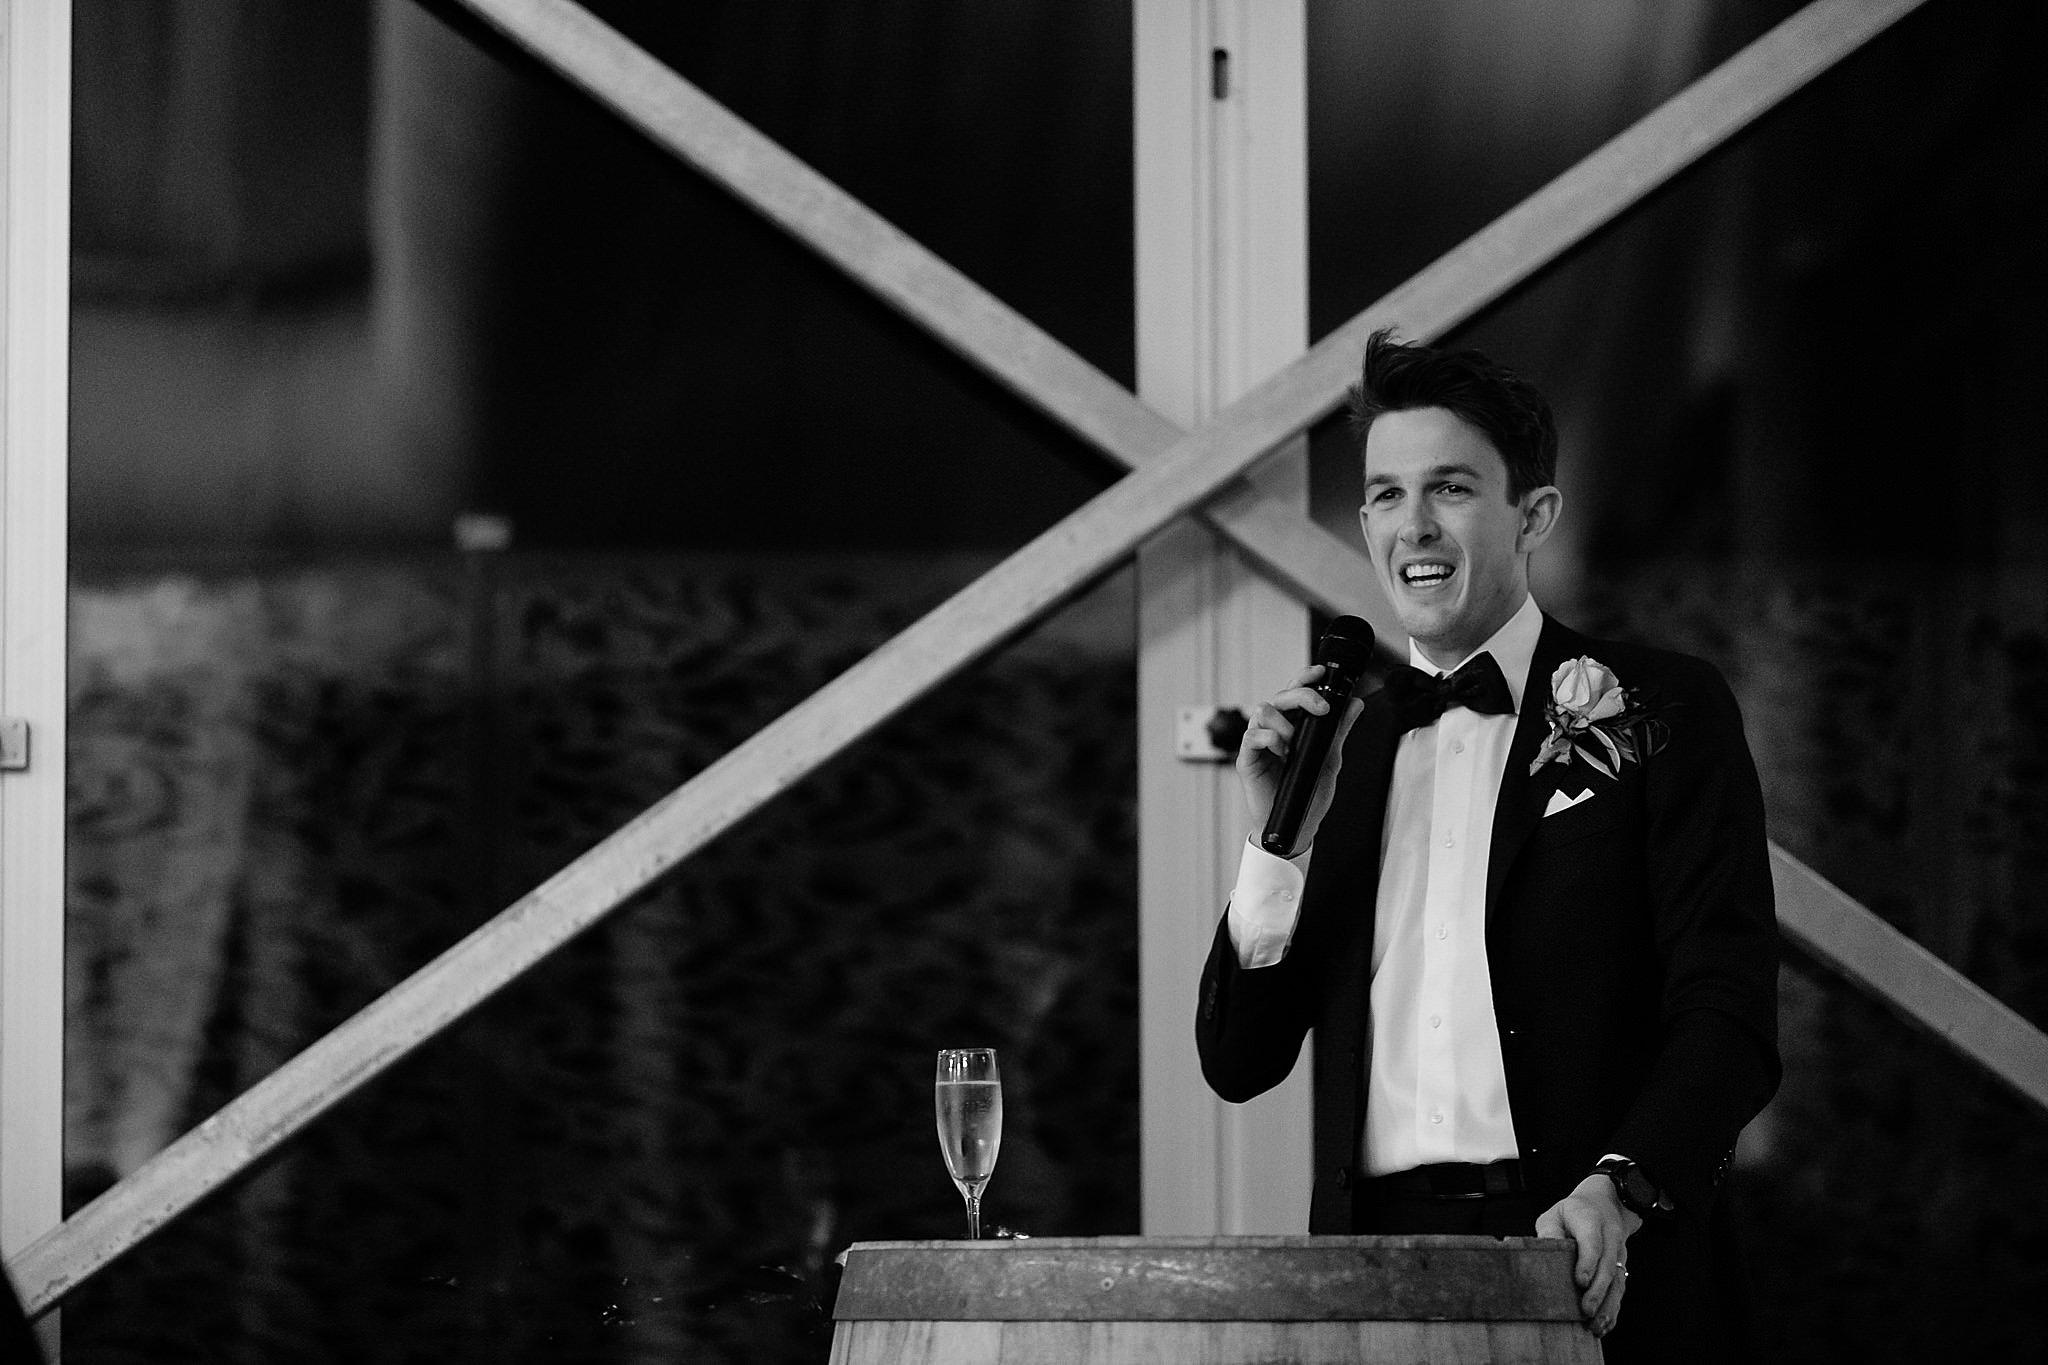 canberra florist,Canberra Portrait Photography,Keepsakephoto by the Keeffes,ACT wedding photographer,ACT weddings,canberra wedding,Canberra Wedding Photographer,Canberra Wedding Photography,canberra weddings,destination wedding,destination wedding photography,Canberra Winter Wedding,Barn Wedding,Wiluna studio,